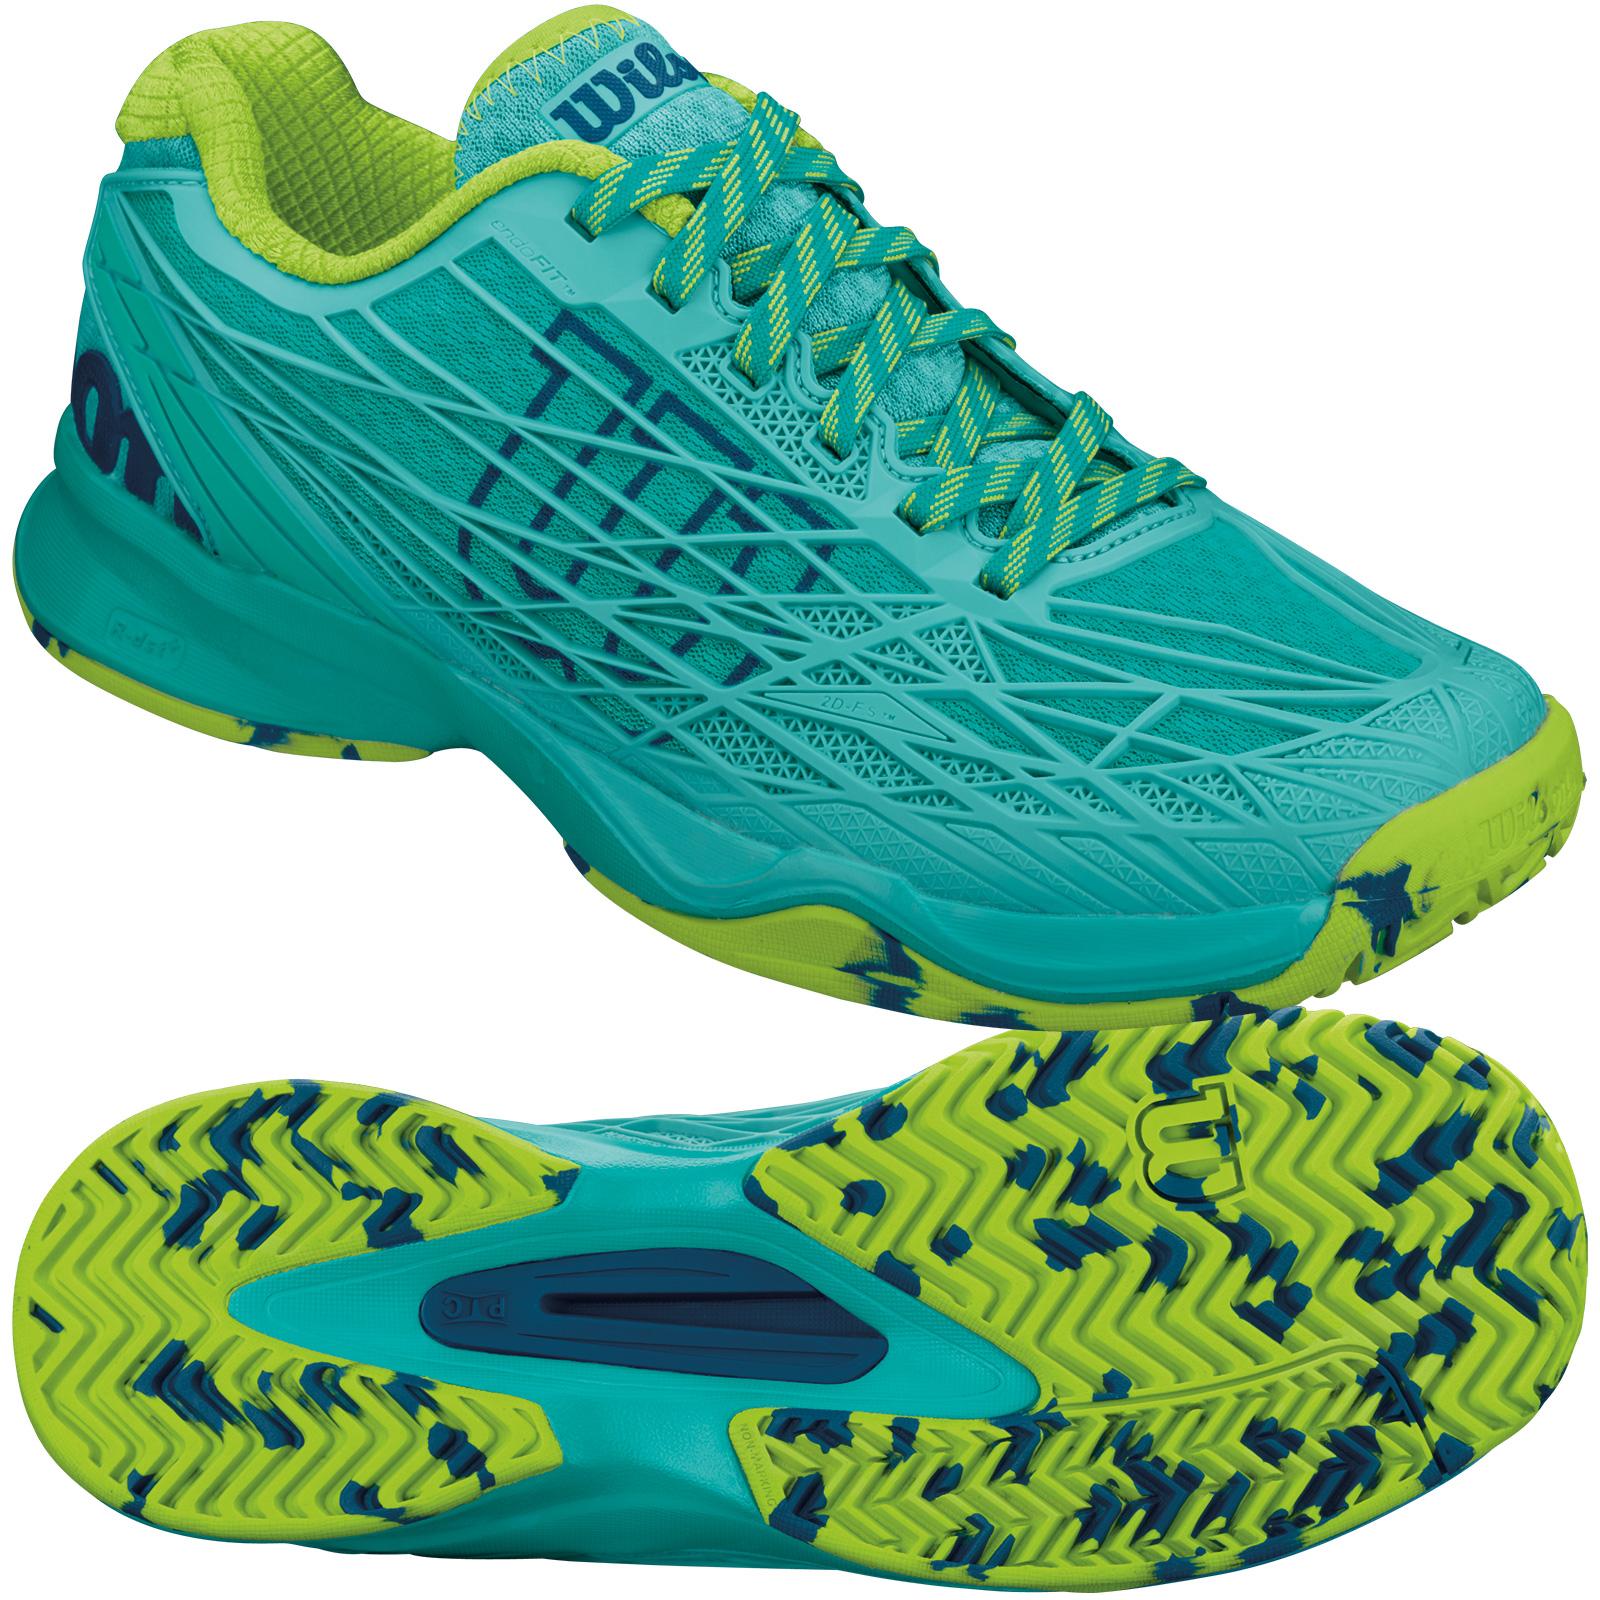 wilson kaos tennis shoes ss16 green 6 uk